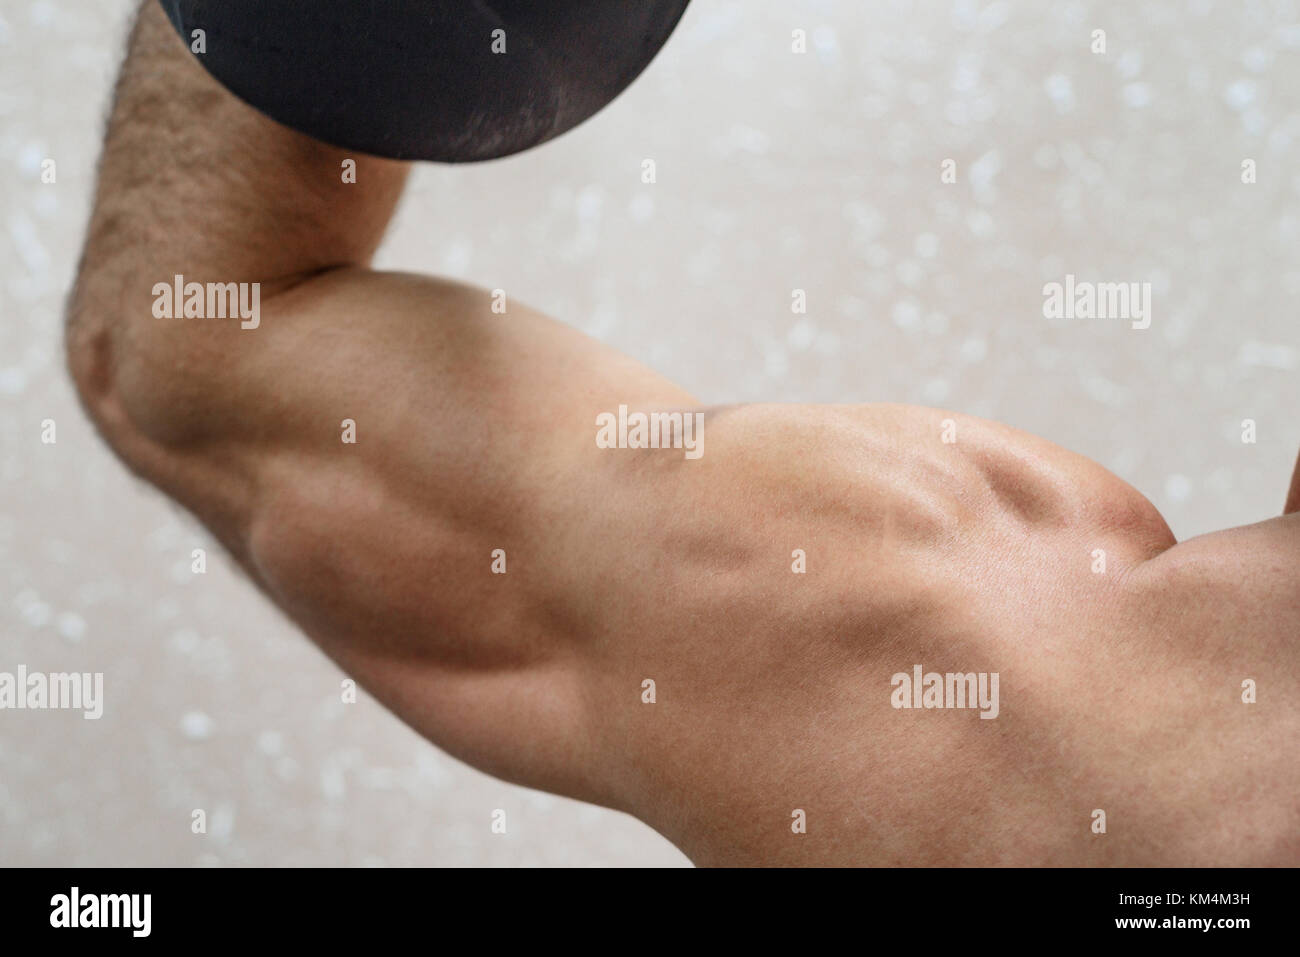 Male athlete doing deltoid exercise with dumbbells Stock Photo